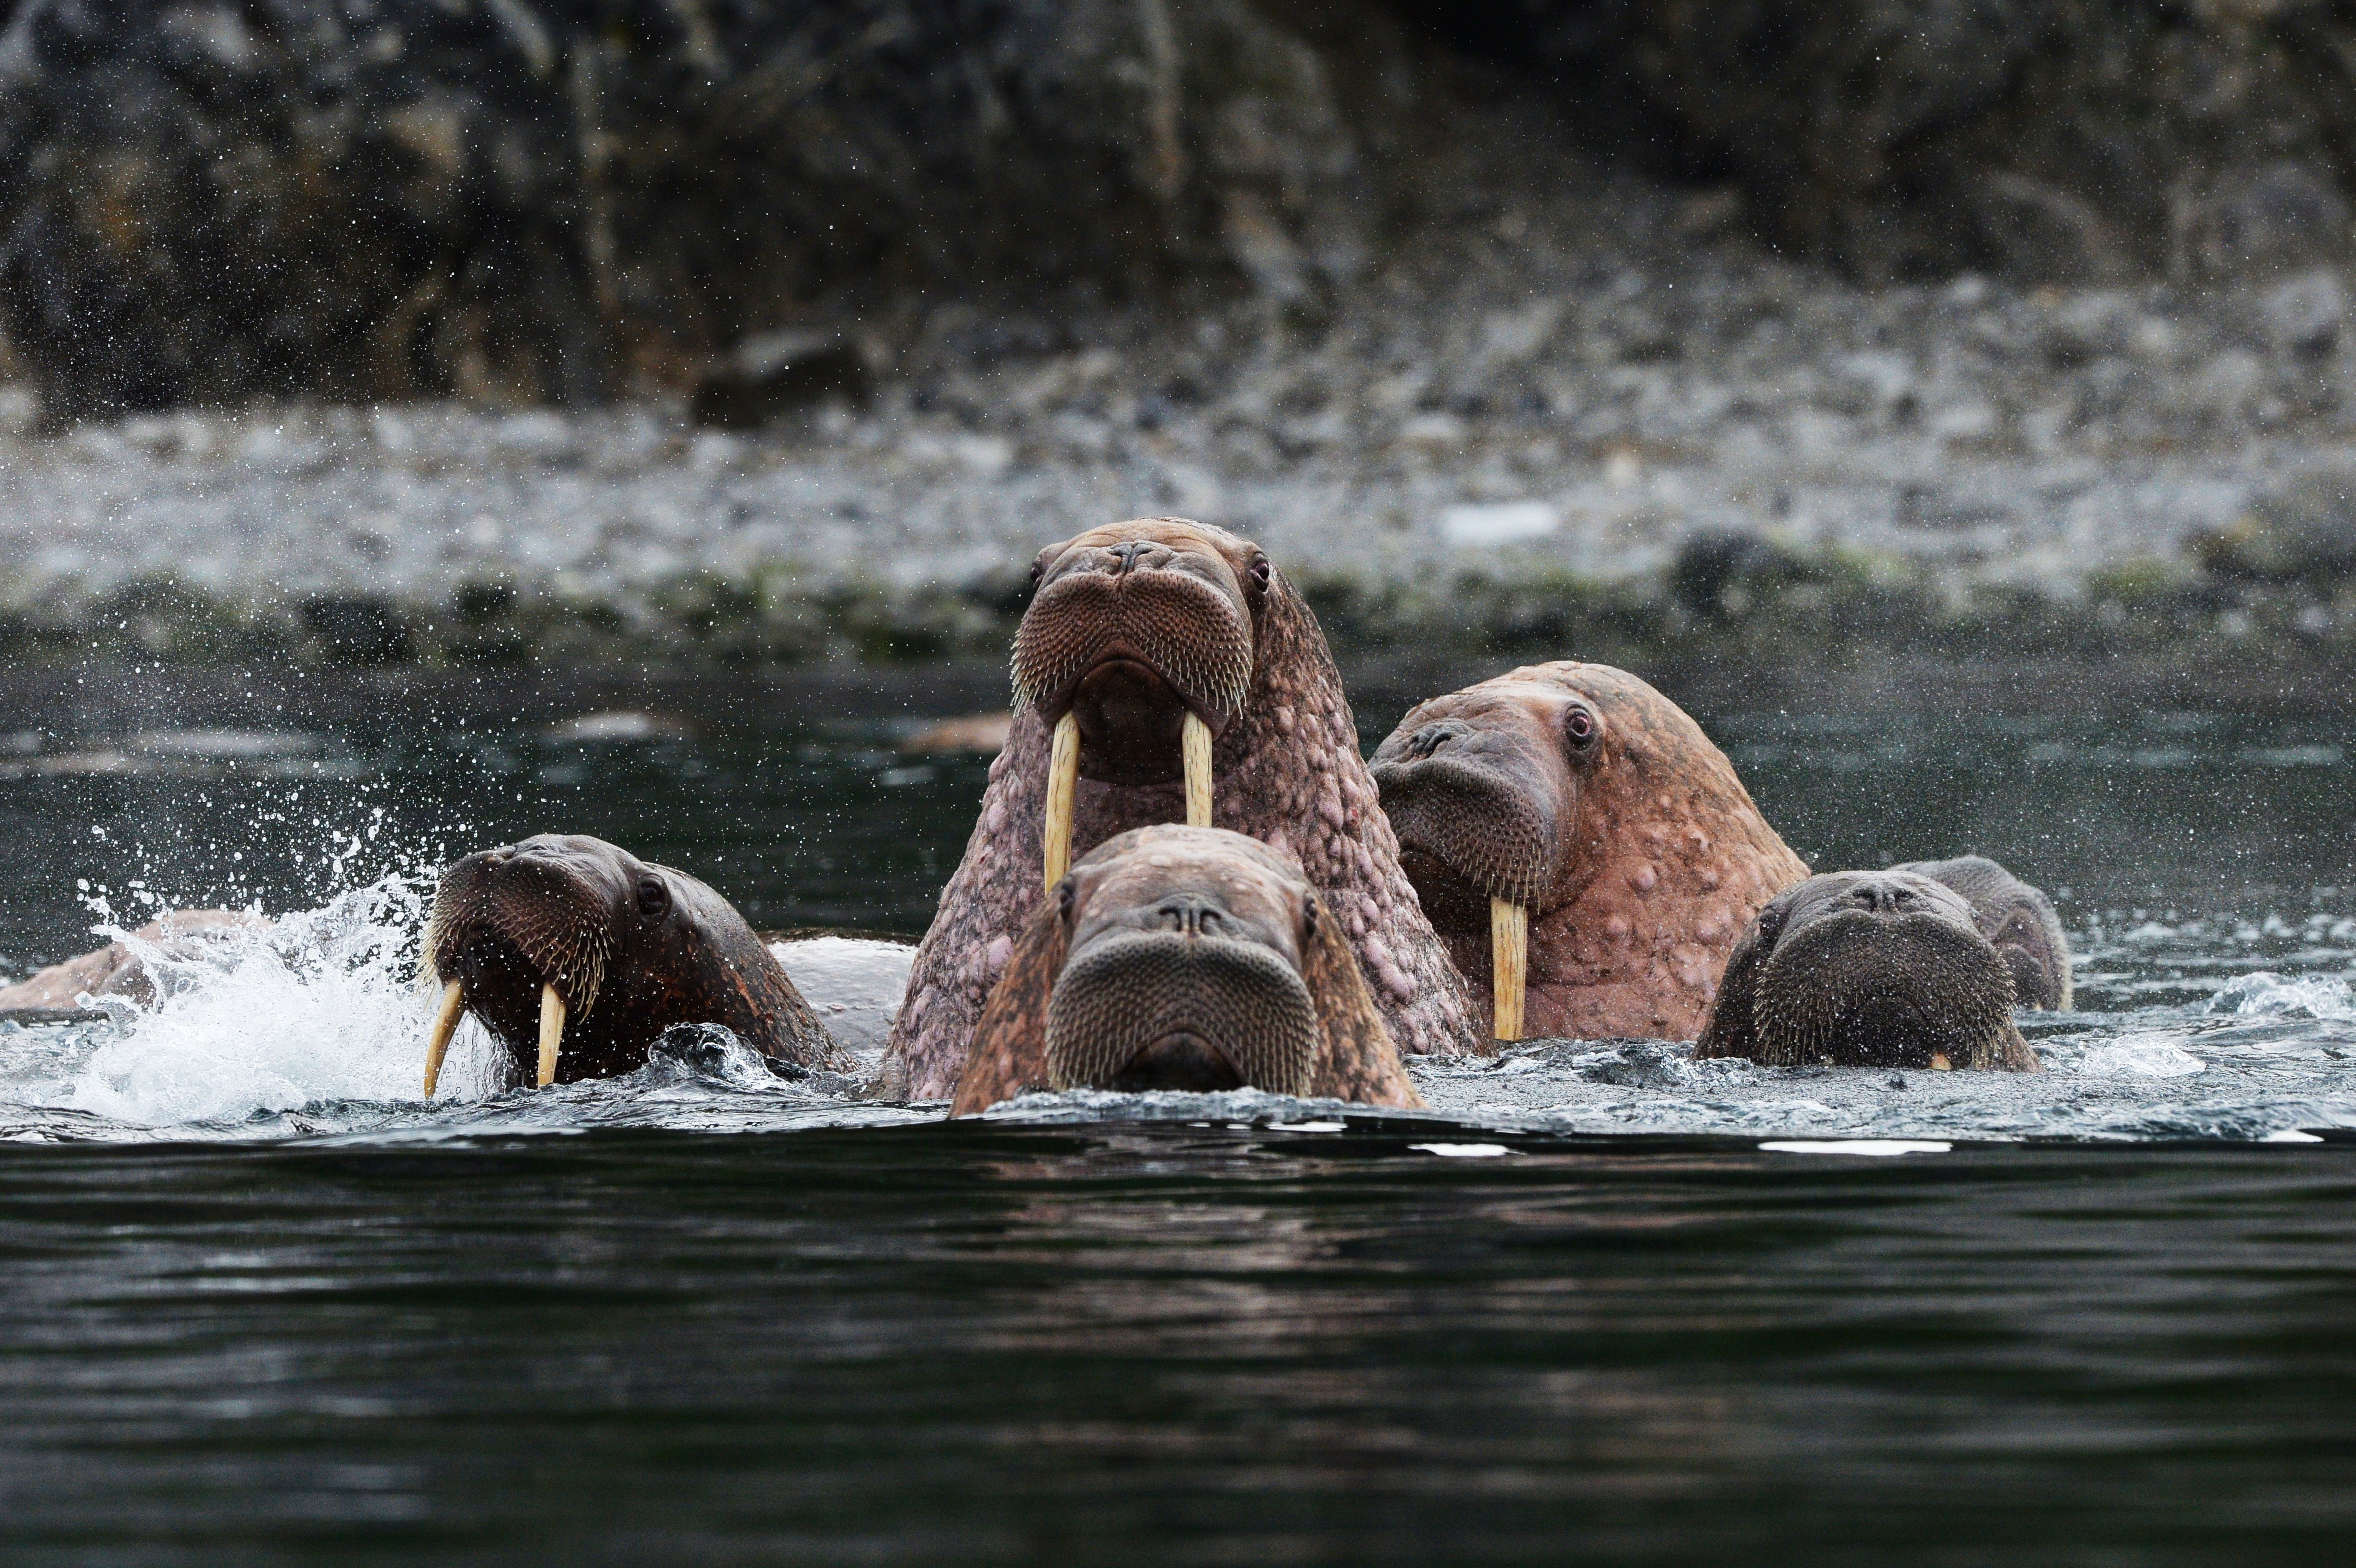 Walruses in the Senyavin Strait near Yttygran Island in the Chukotka Autonomous Area